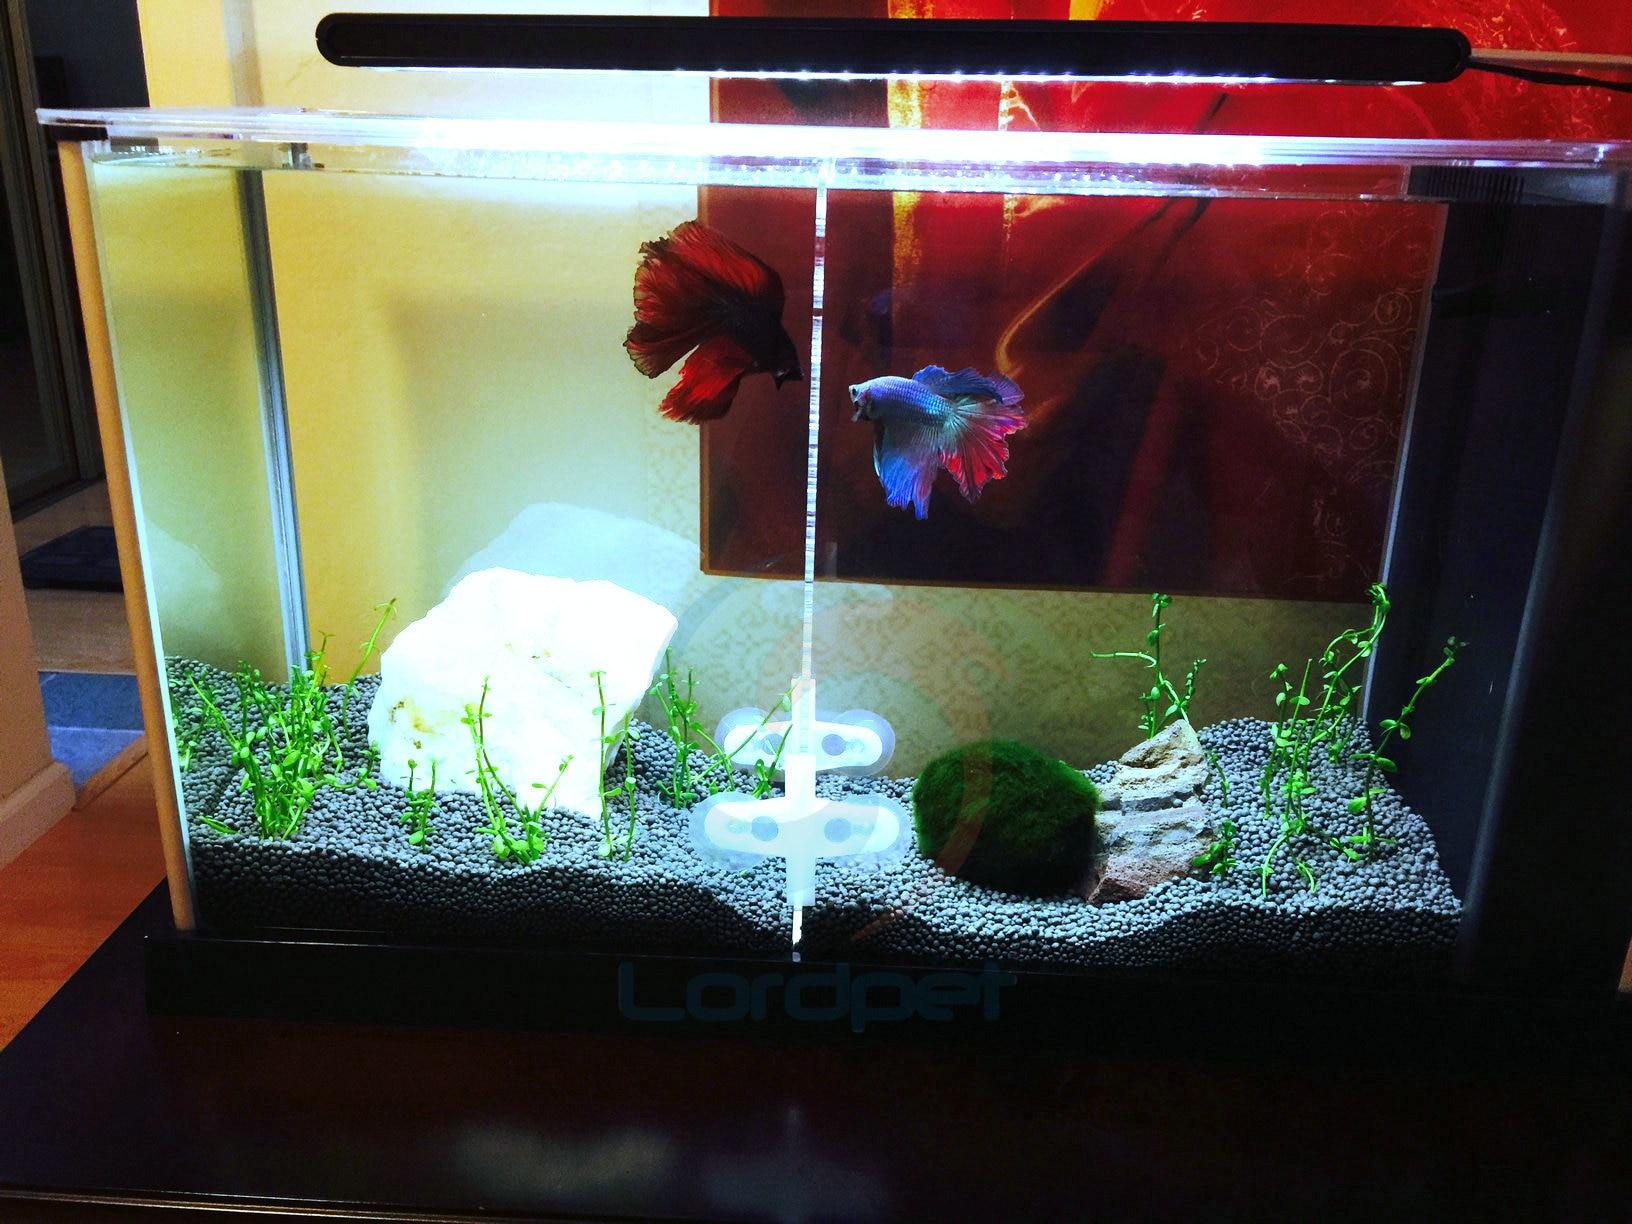 "Aquarium Clear Acrylic Divider 0 24"" Holes 0 12"" Thick 4pcs Suction"